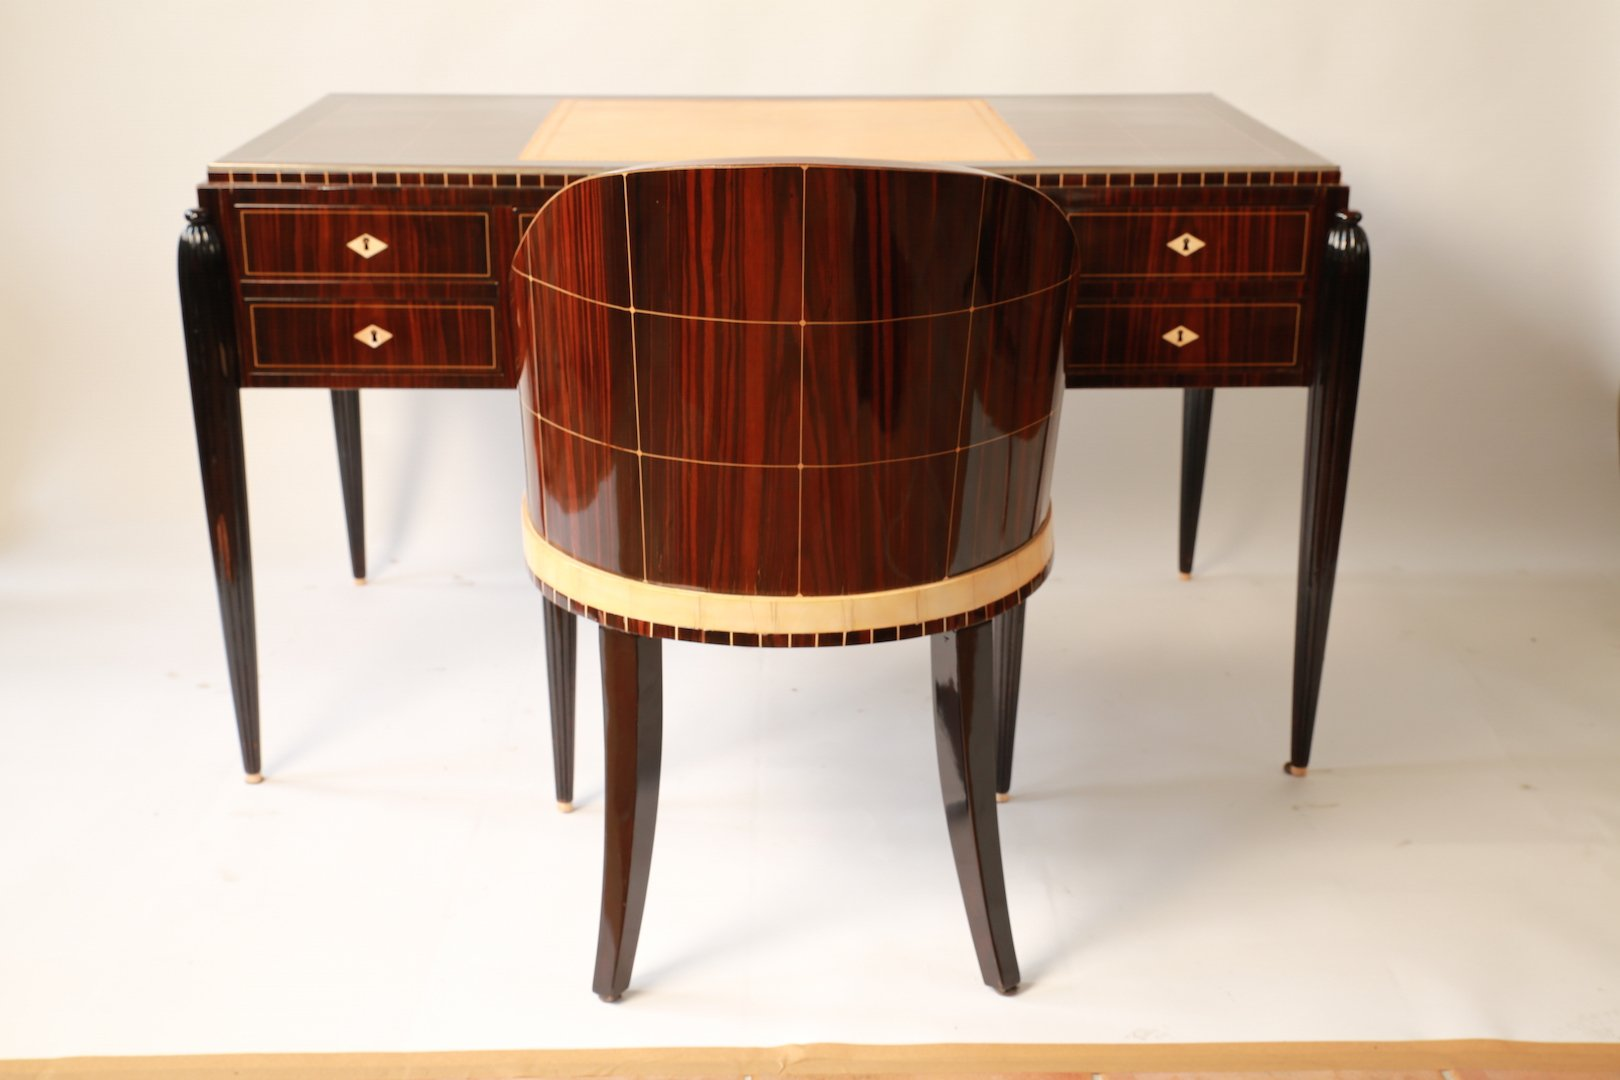 art d co desk chair ensemble 1920s for sale at pamono. Black Bedroom Furniture Sets. Home Design Ideas